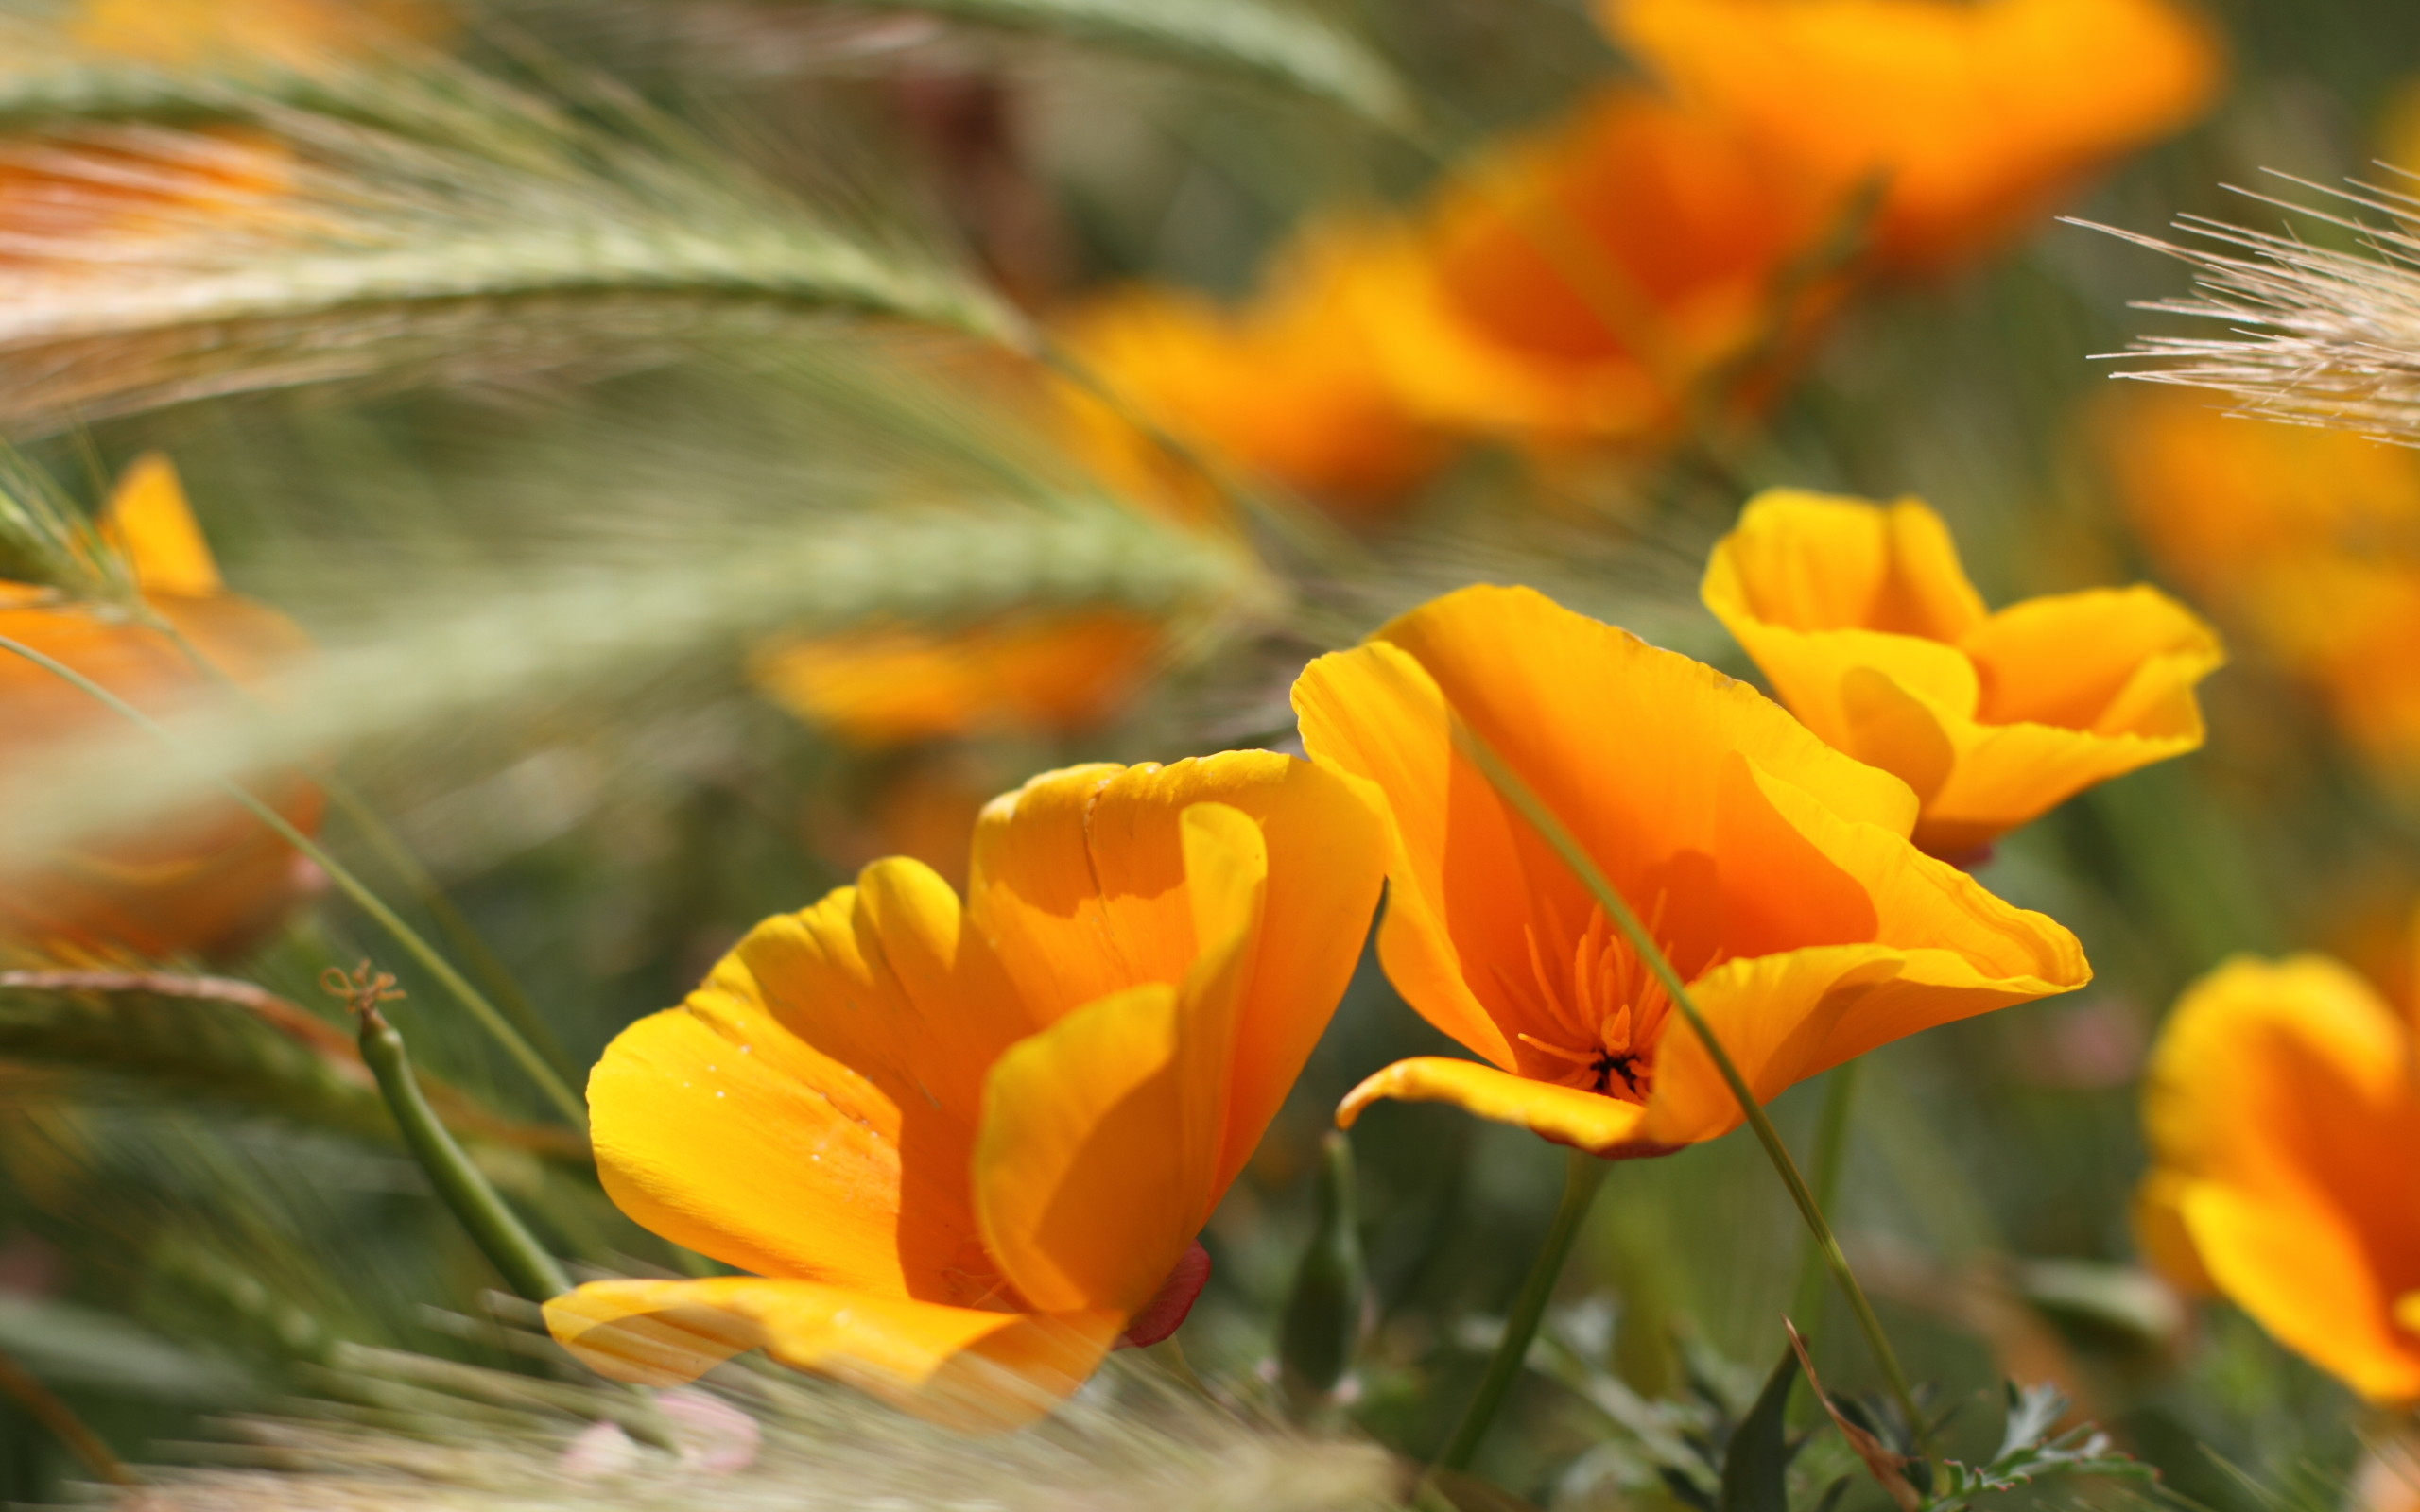 Res: 2560x1600, Summer Flowers Wallpaper